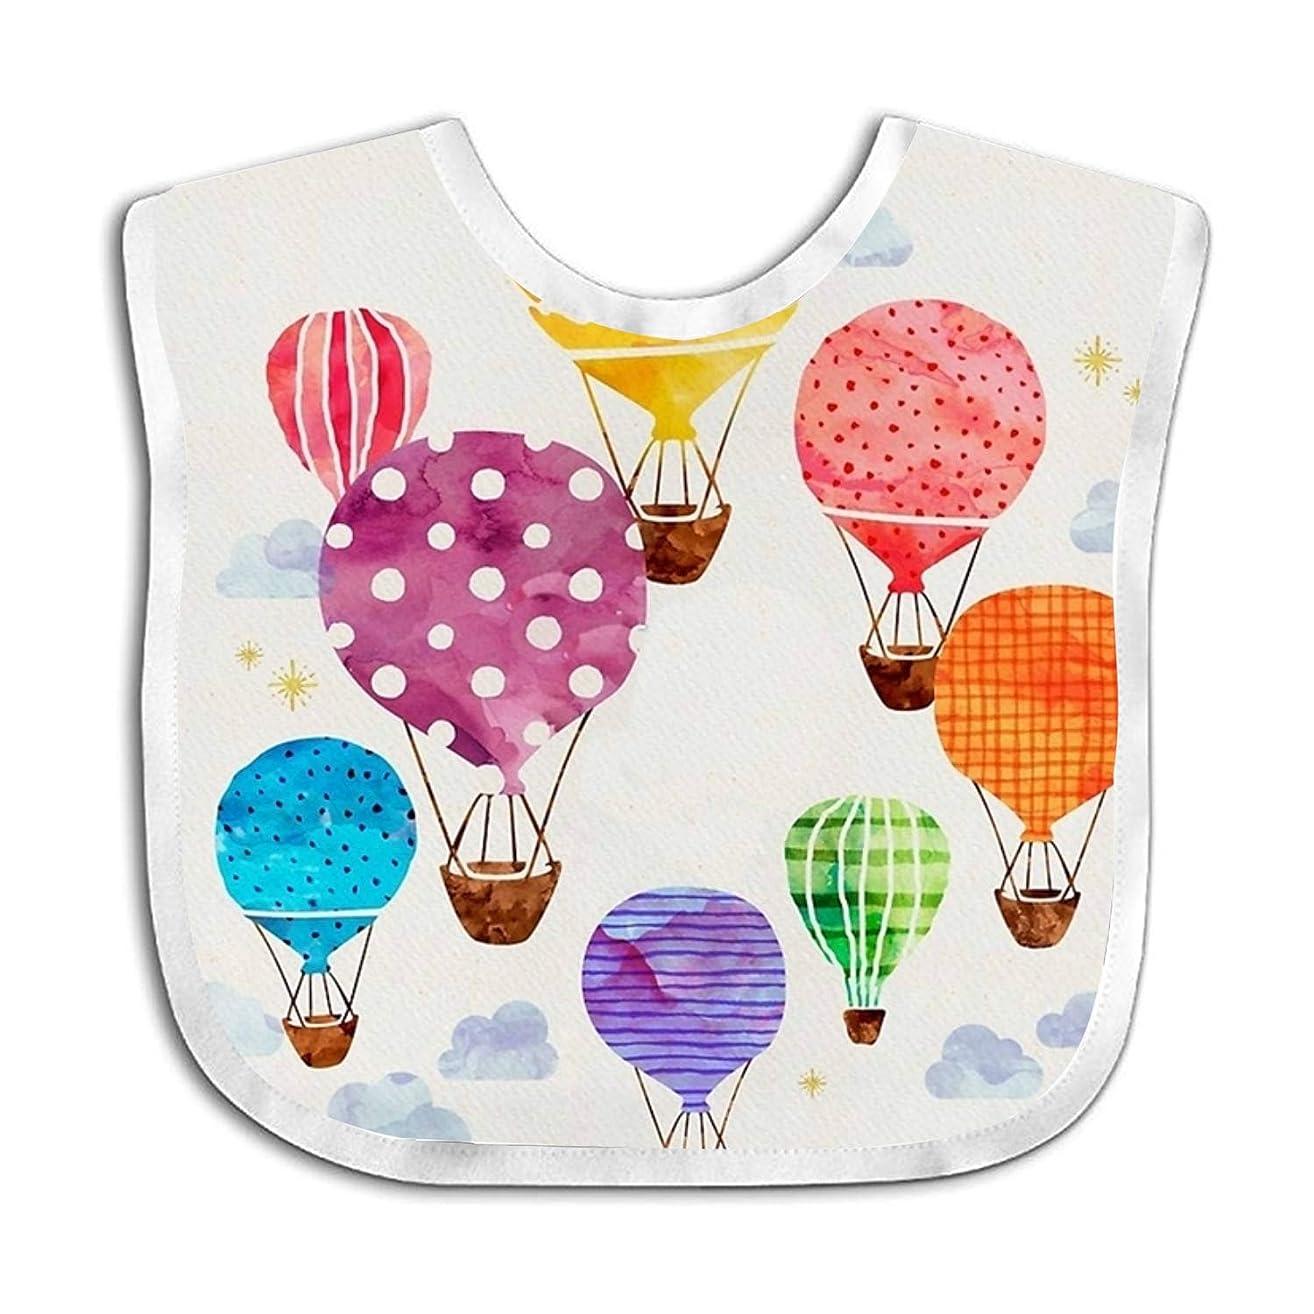 Hot Air Balloon Teething Bib Adjustable Feeding Bibs Soft Gift For Toddlers Waterproof